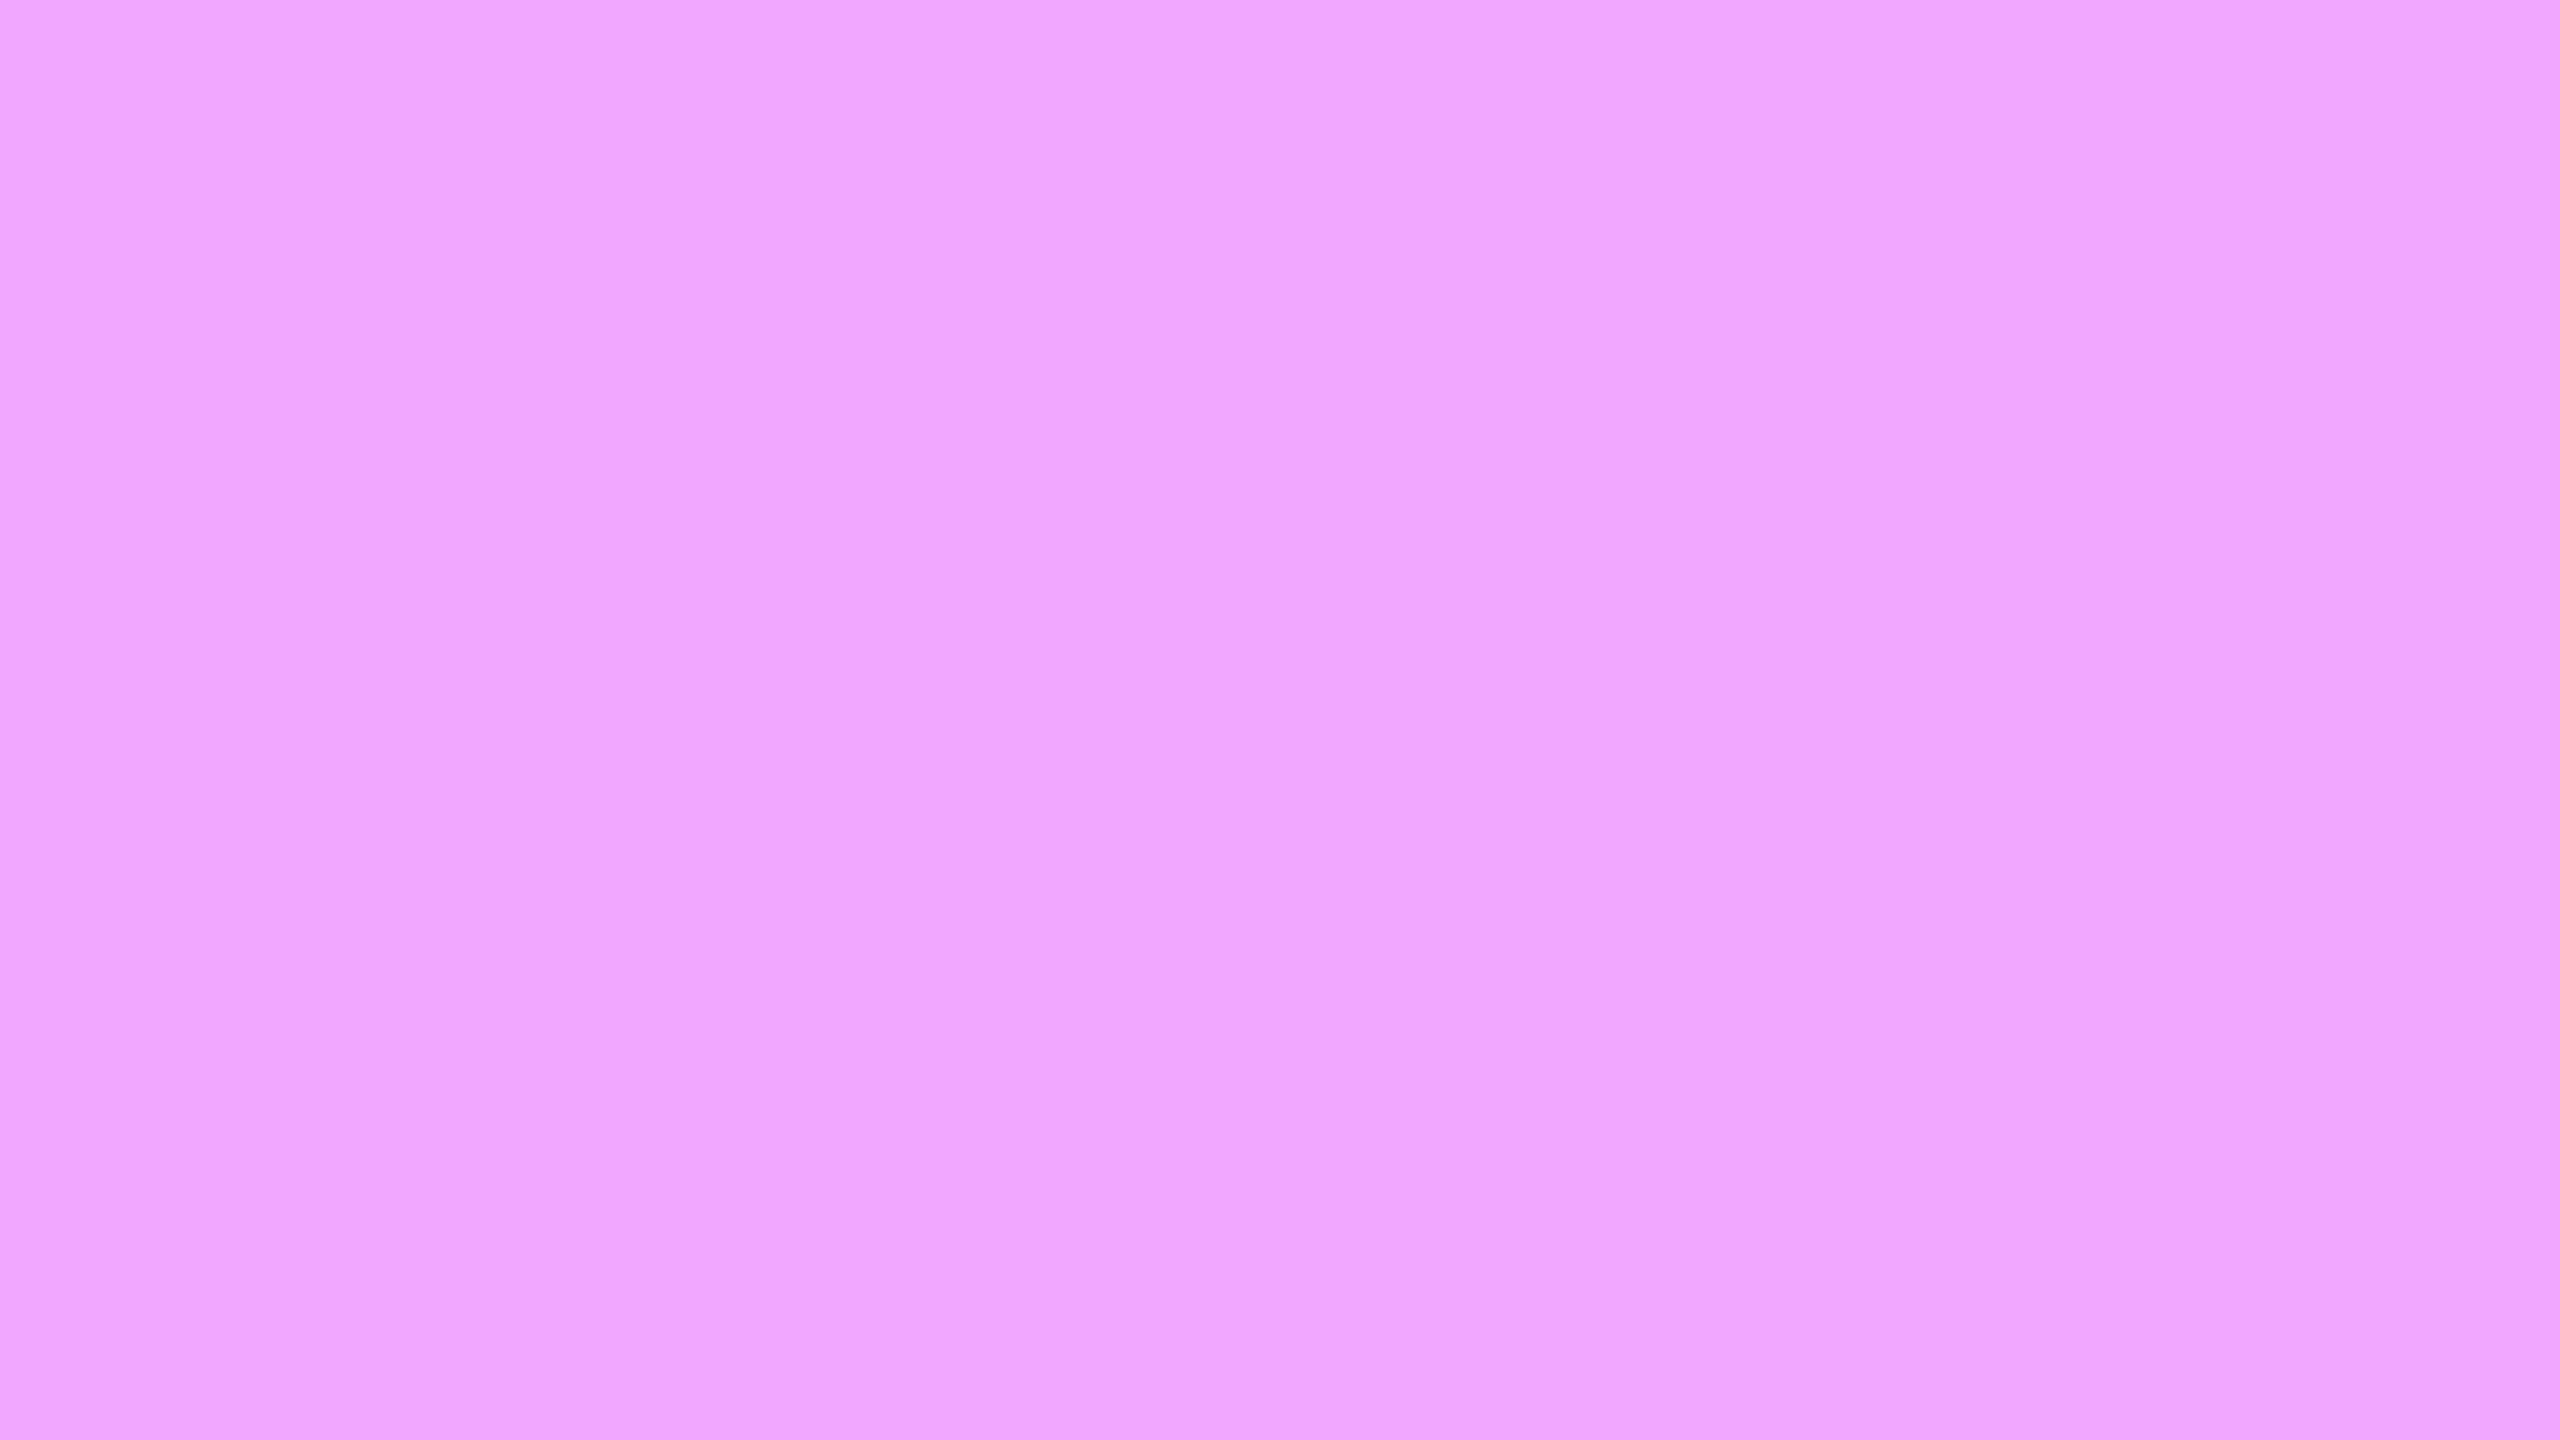 2560x1440 rich brilliant lavender solid color background - Wallpaper lavender color ...